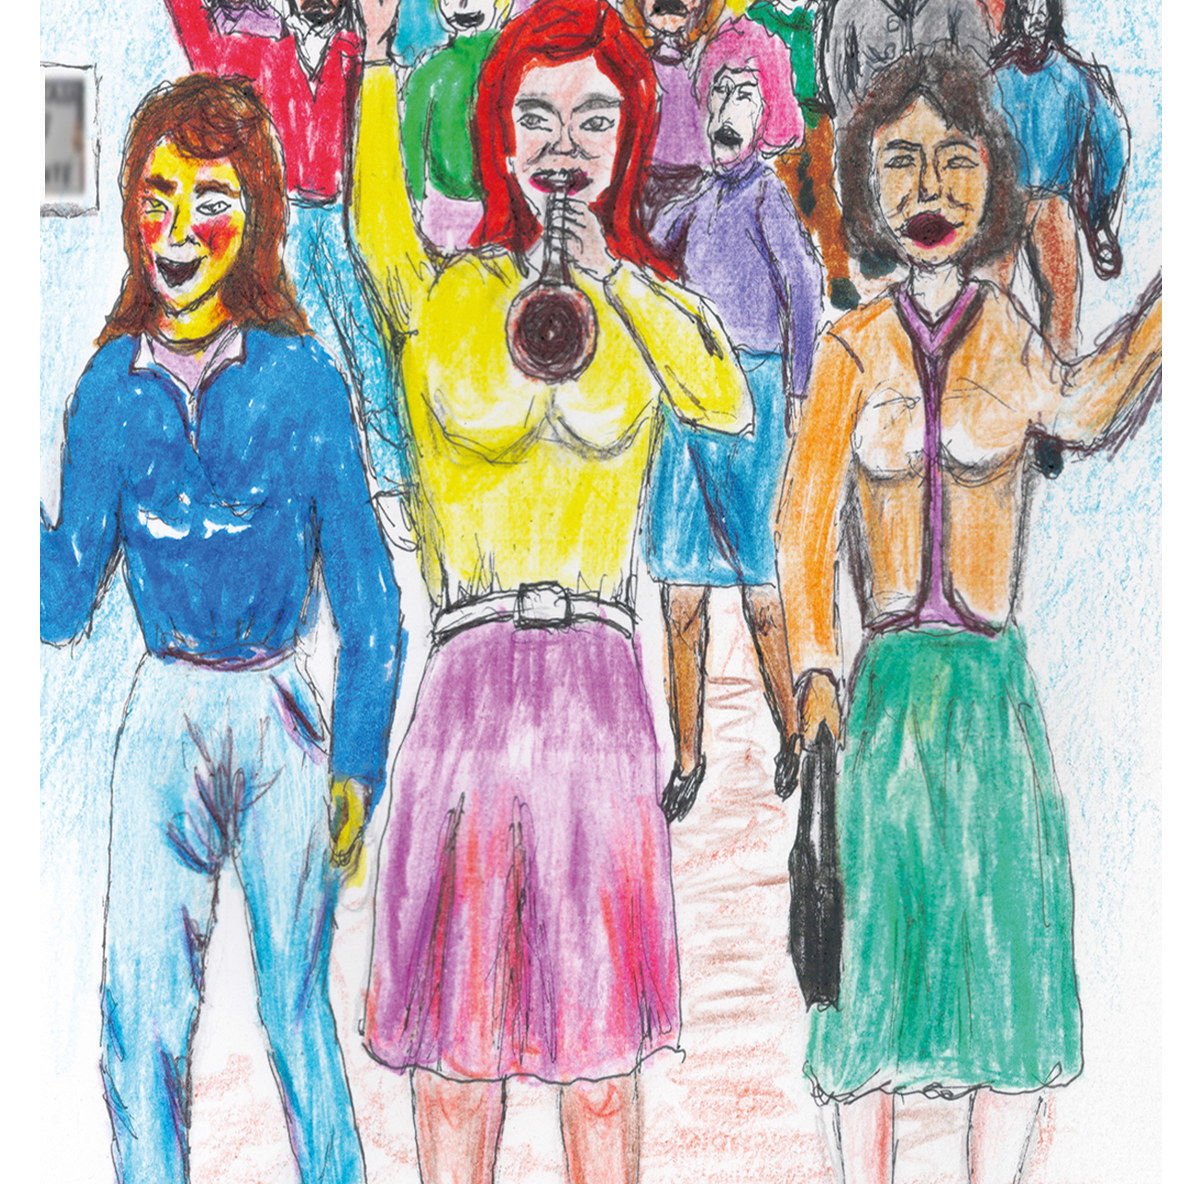 Xornadas da Muller